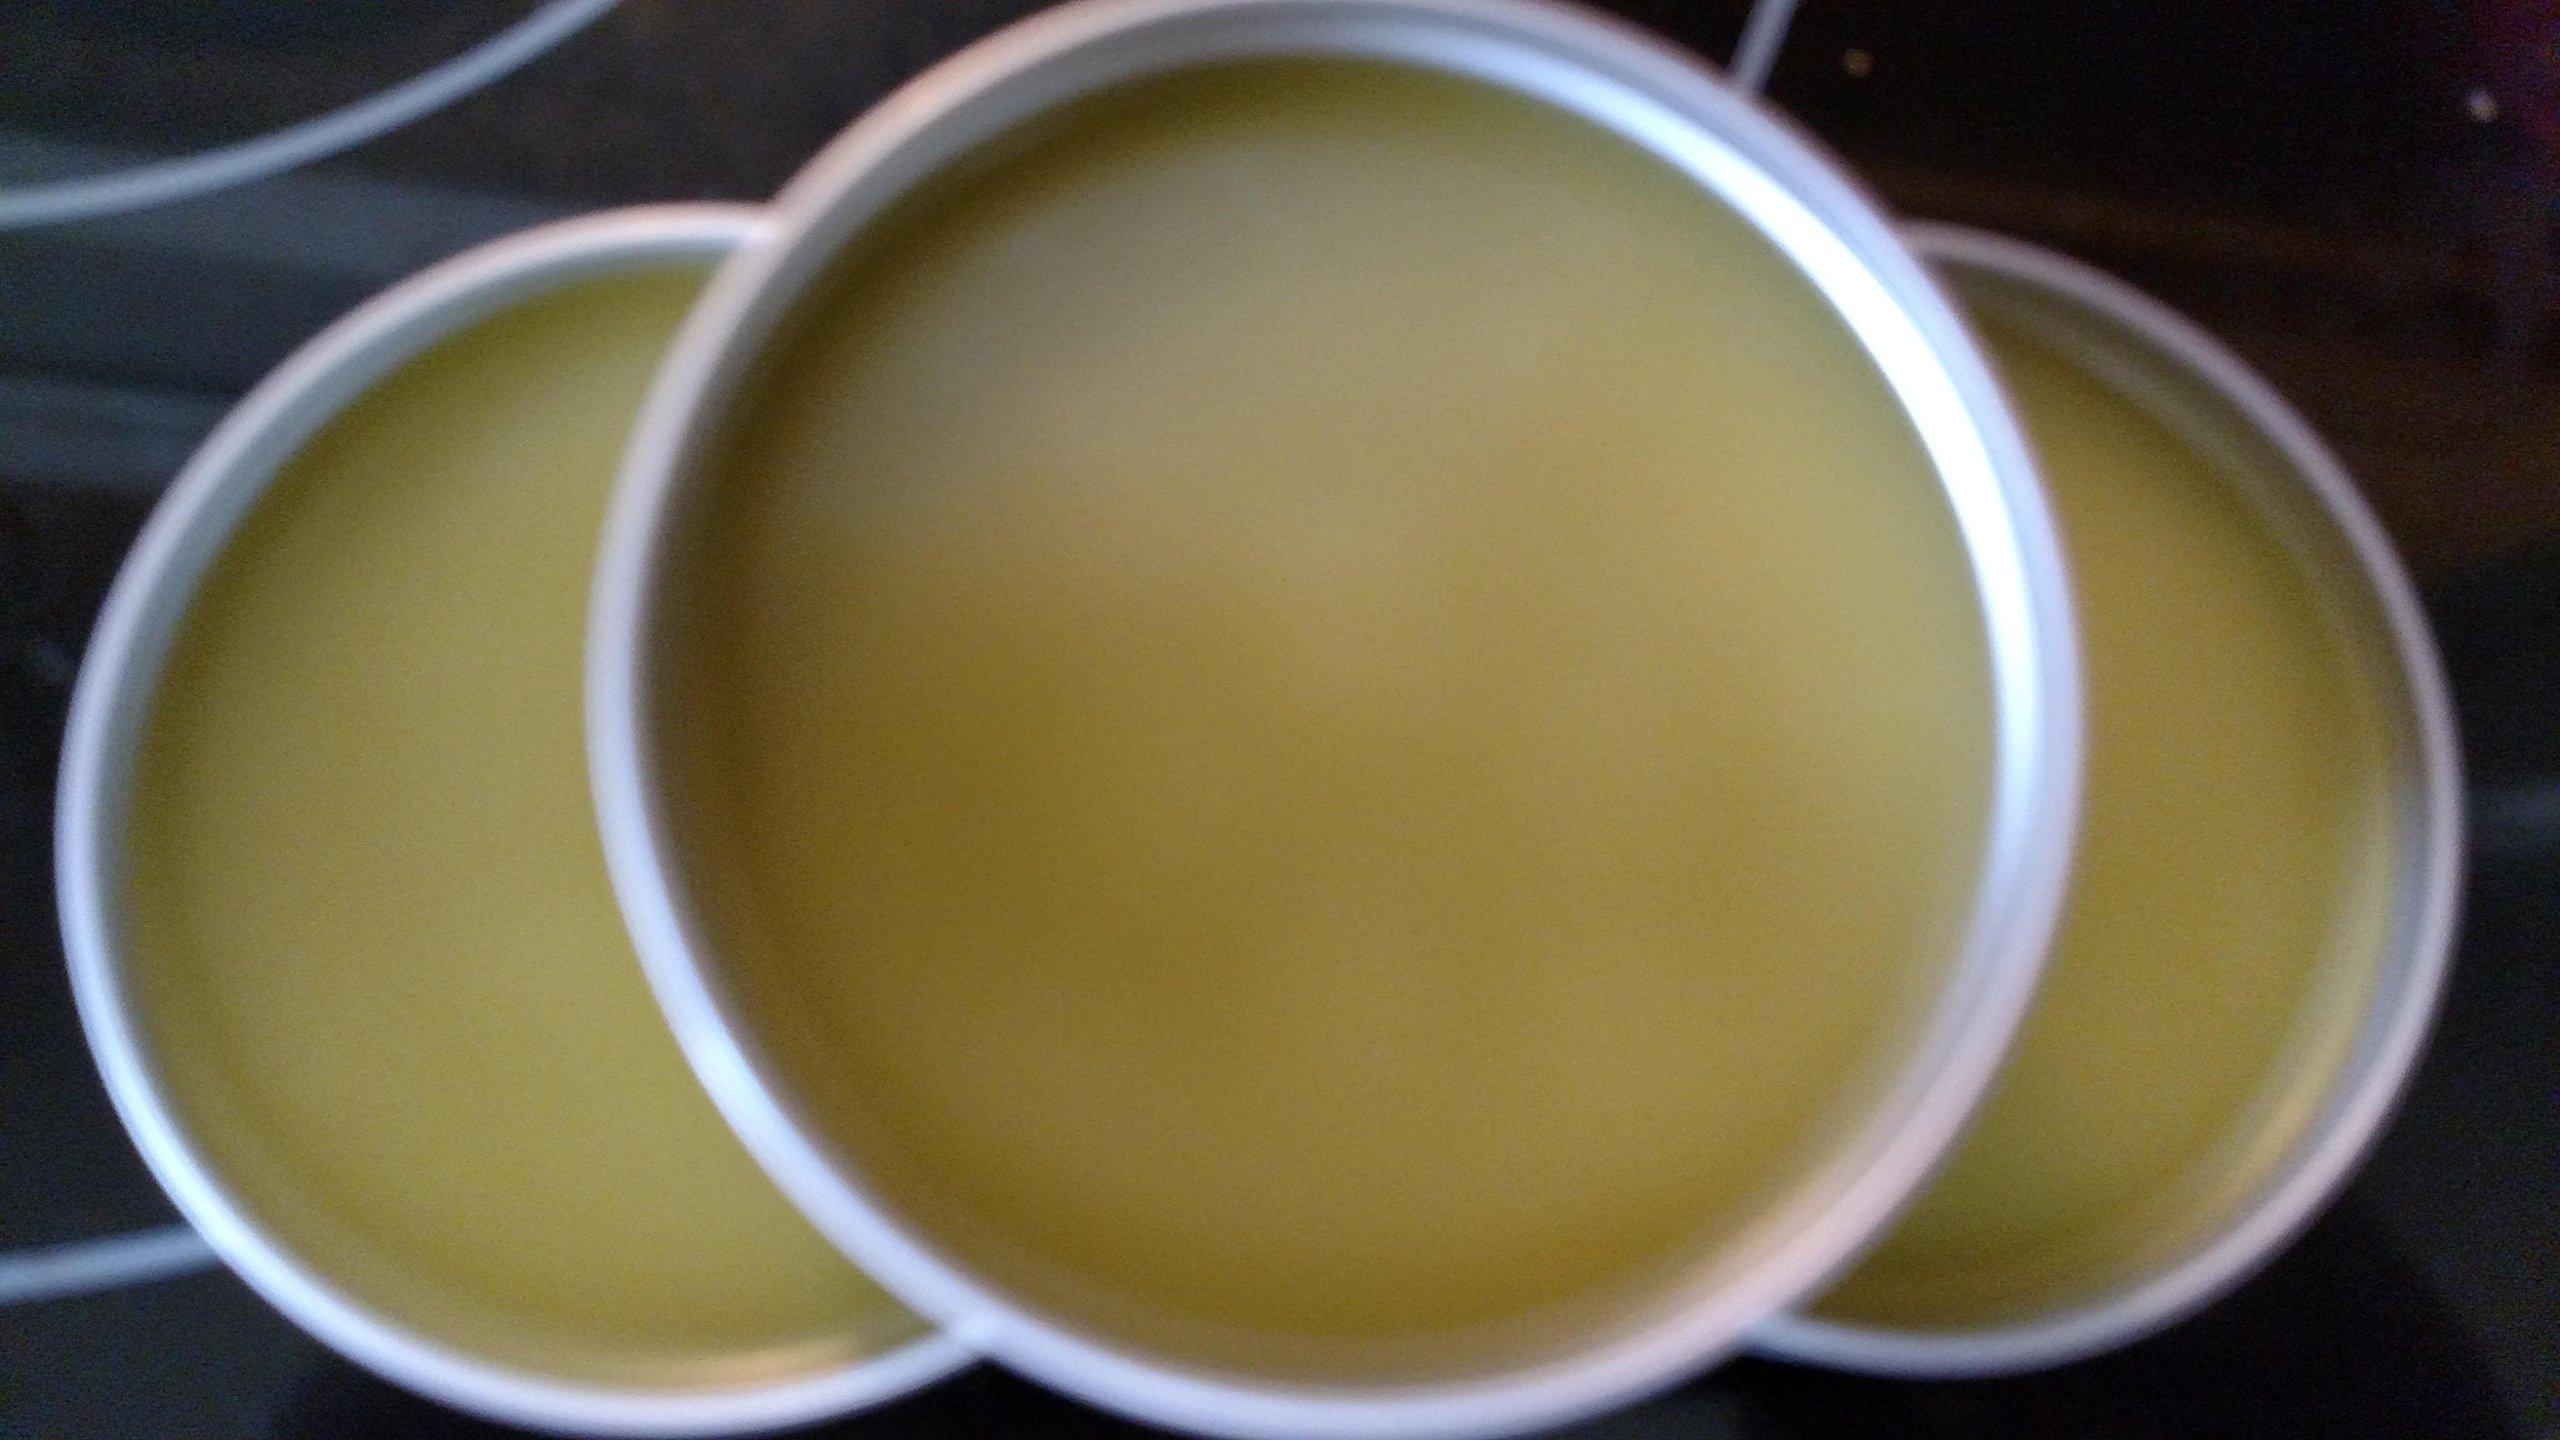 Herbal Hemp Pain Salve with Hemp Oil and Essential Oils, 2oz